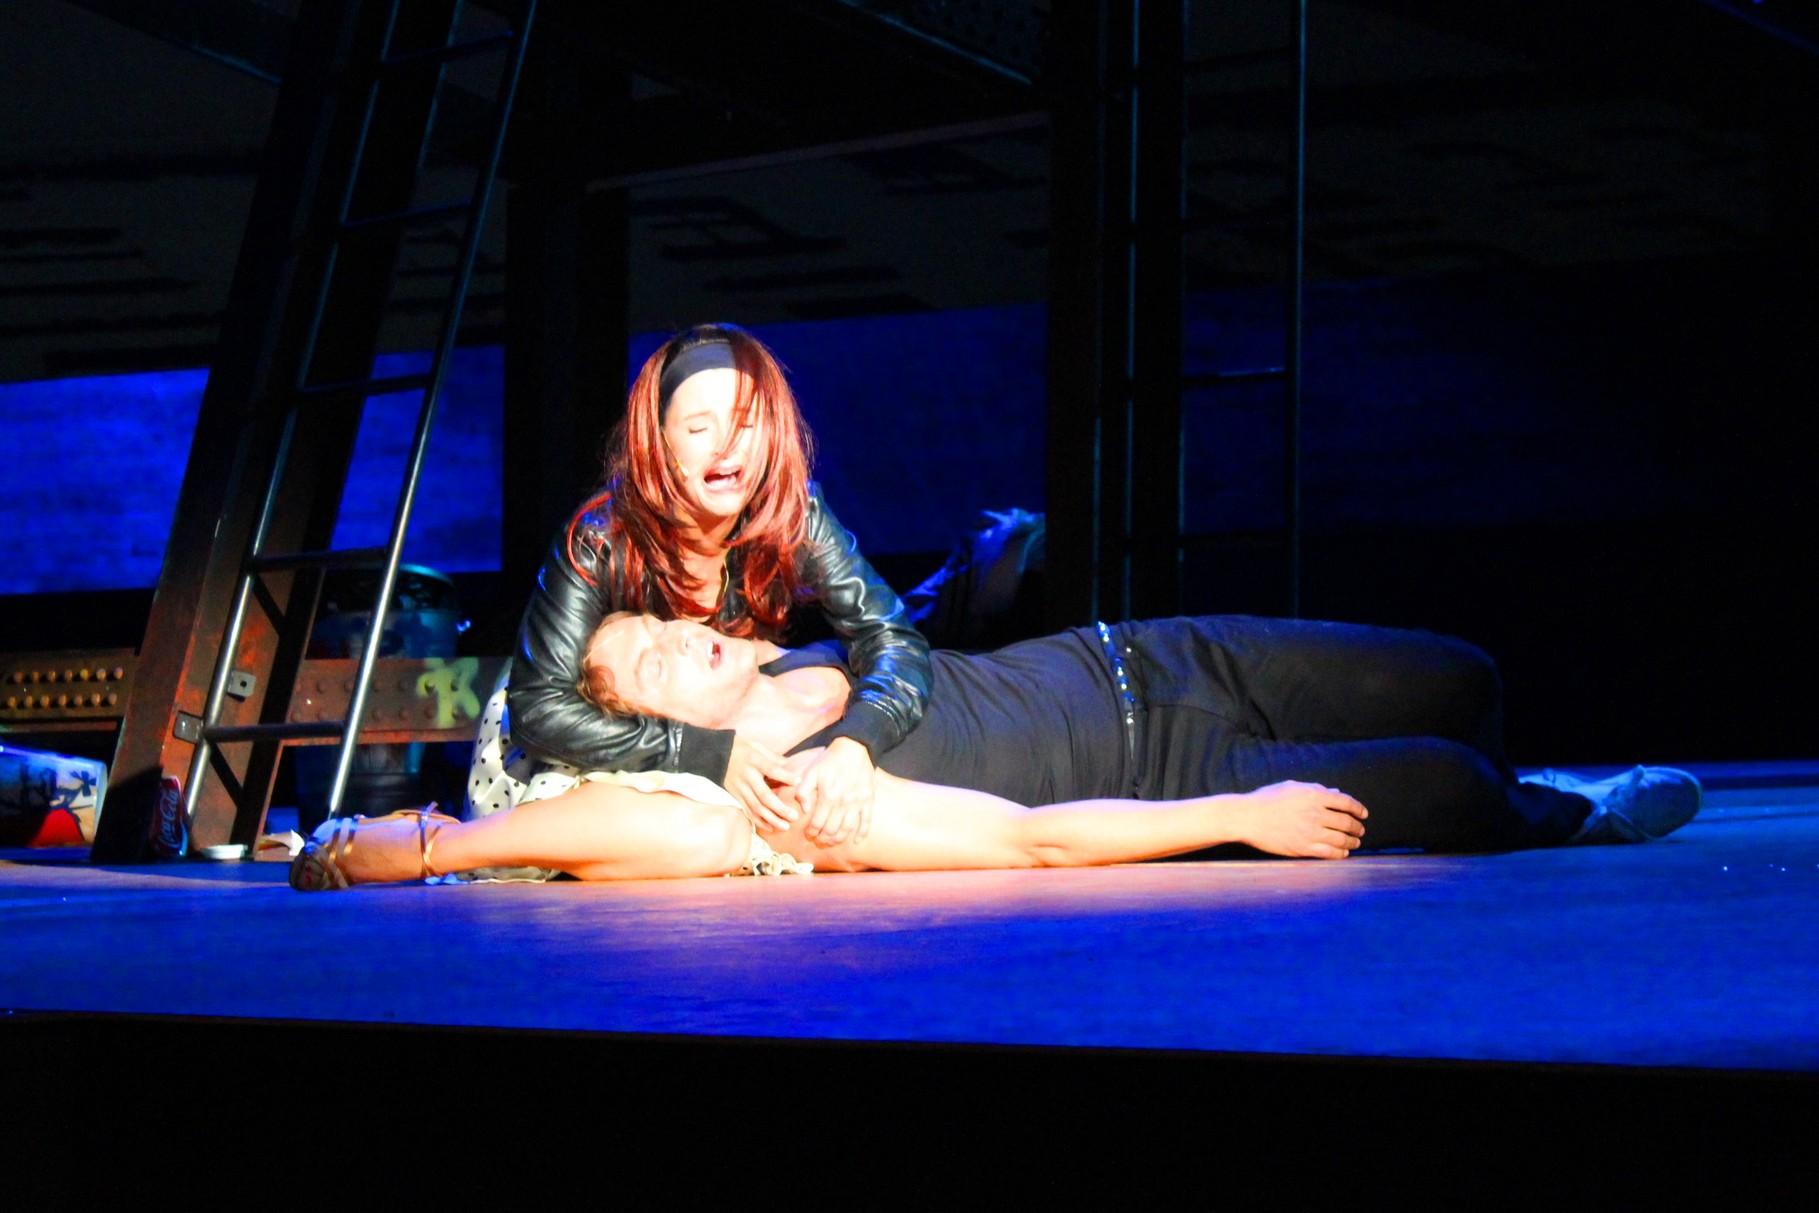 Maria - West Side Story - 2014/15 am Stadttheater Bremerhaven - Kostüm: Siegfried E. Mayer, Maske: Henrik Pecher